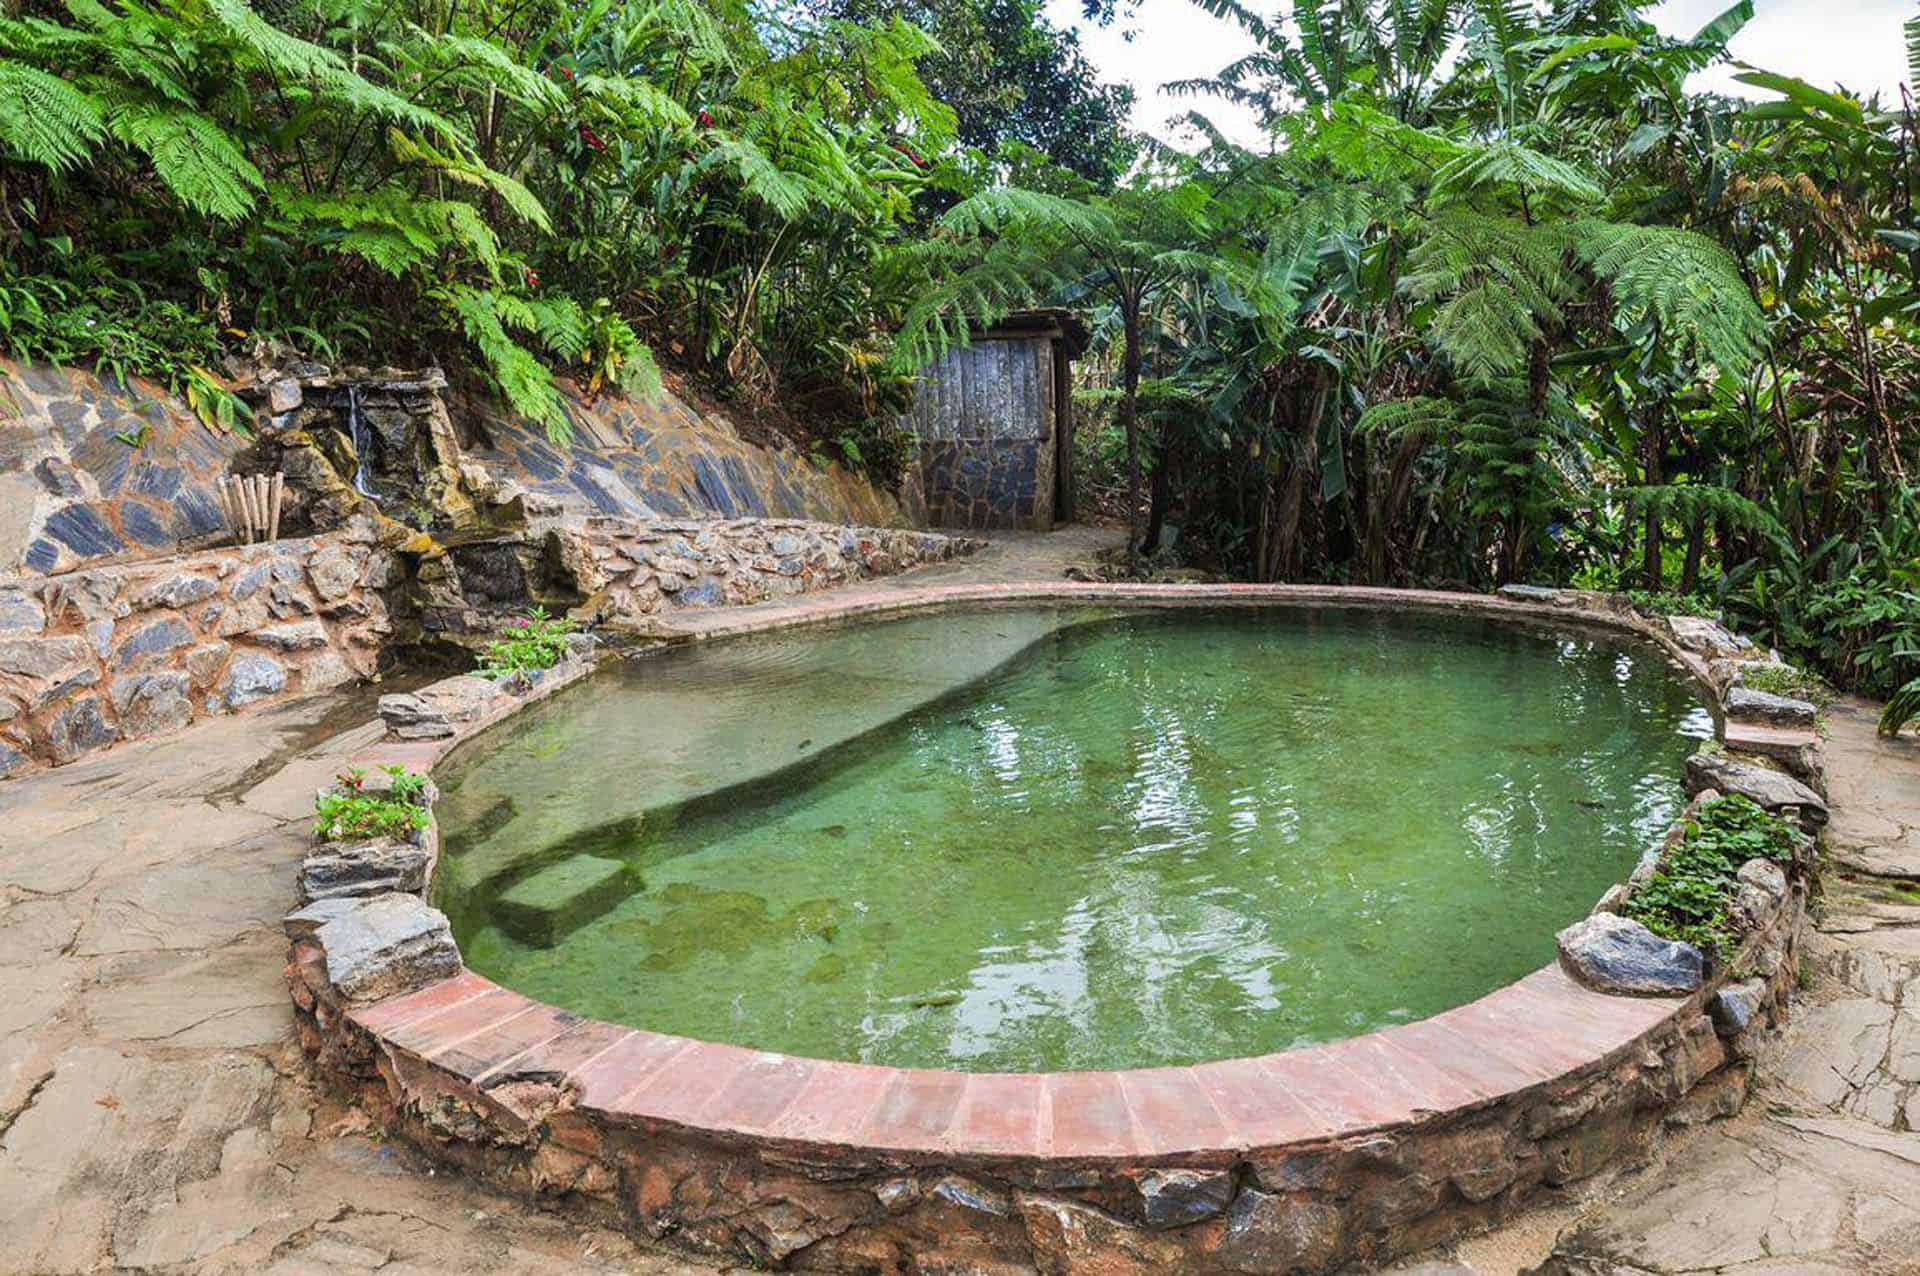 NC0008 Piscine lodge el Manantial trinidad cuba autrement